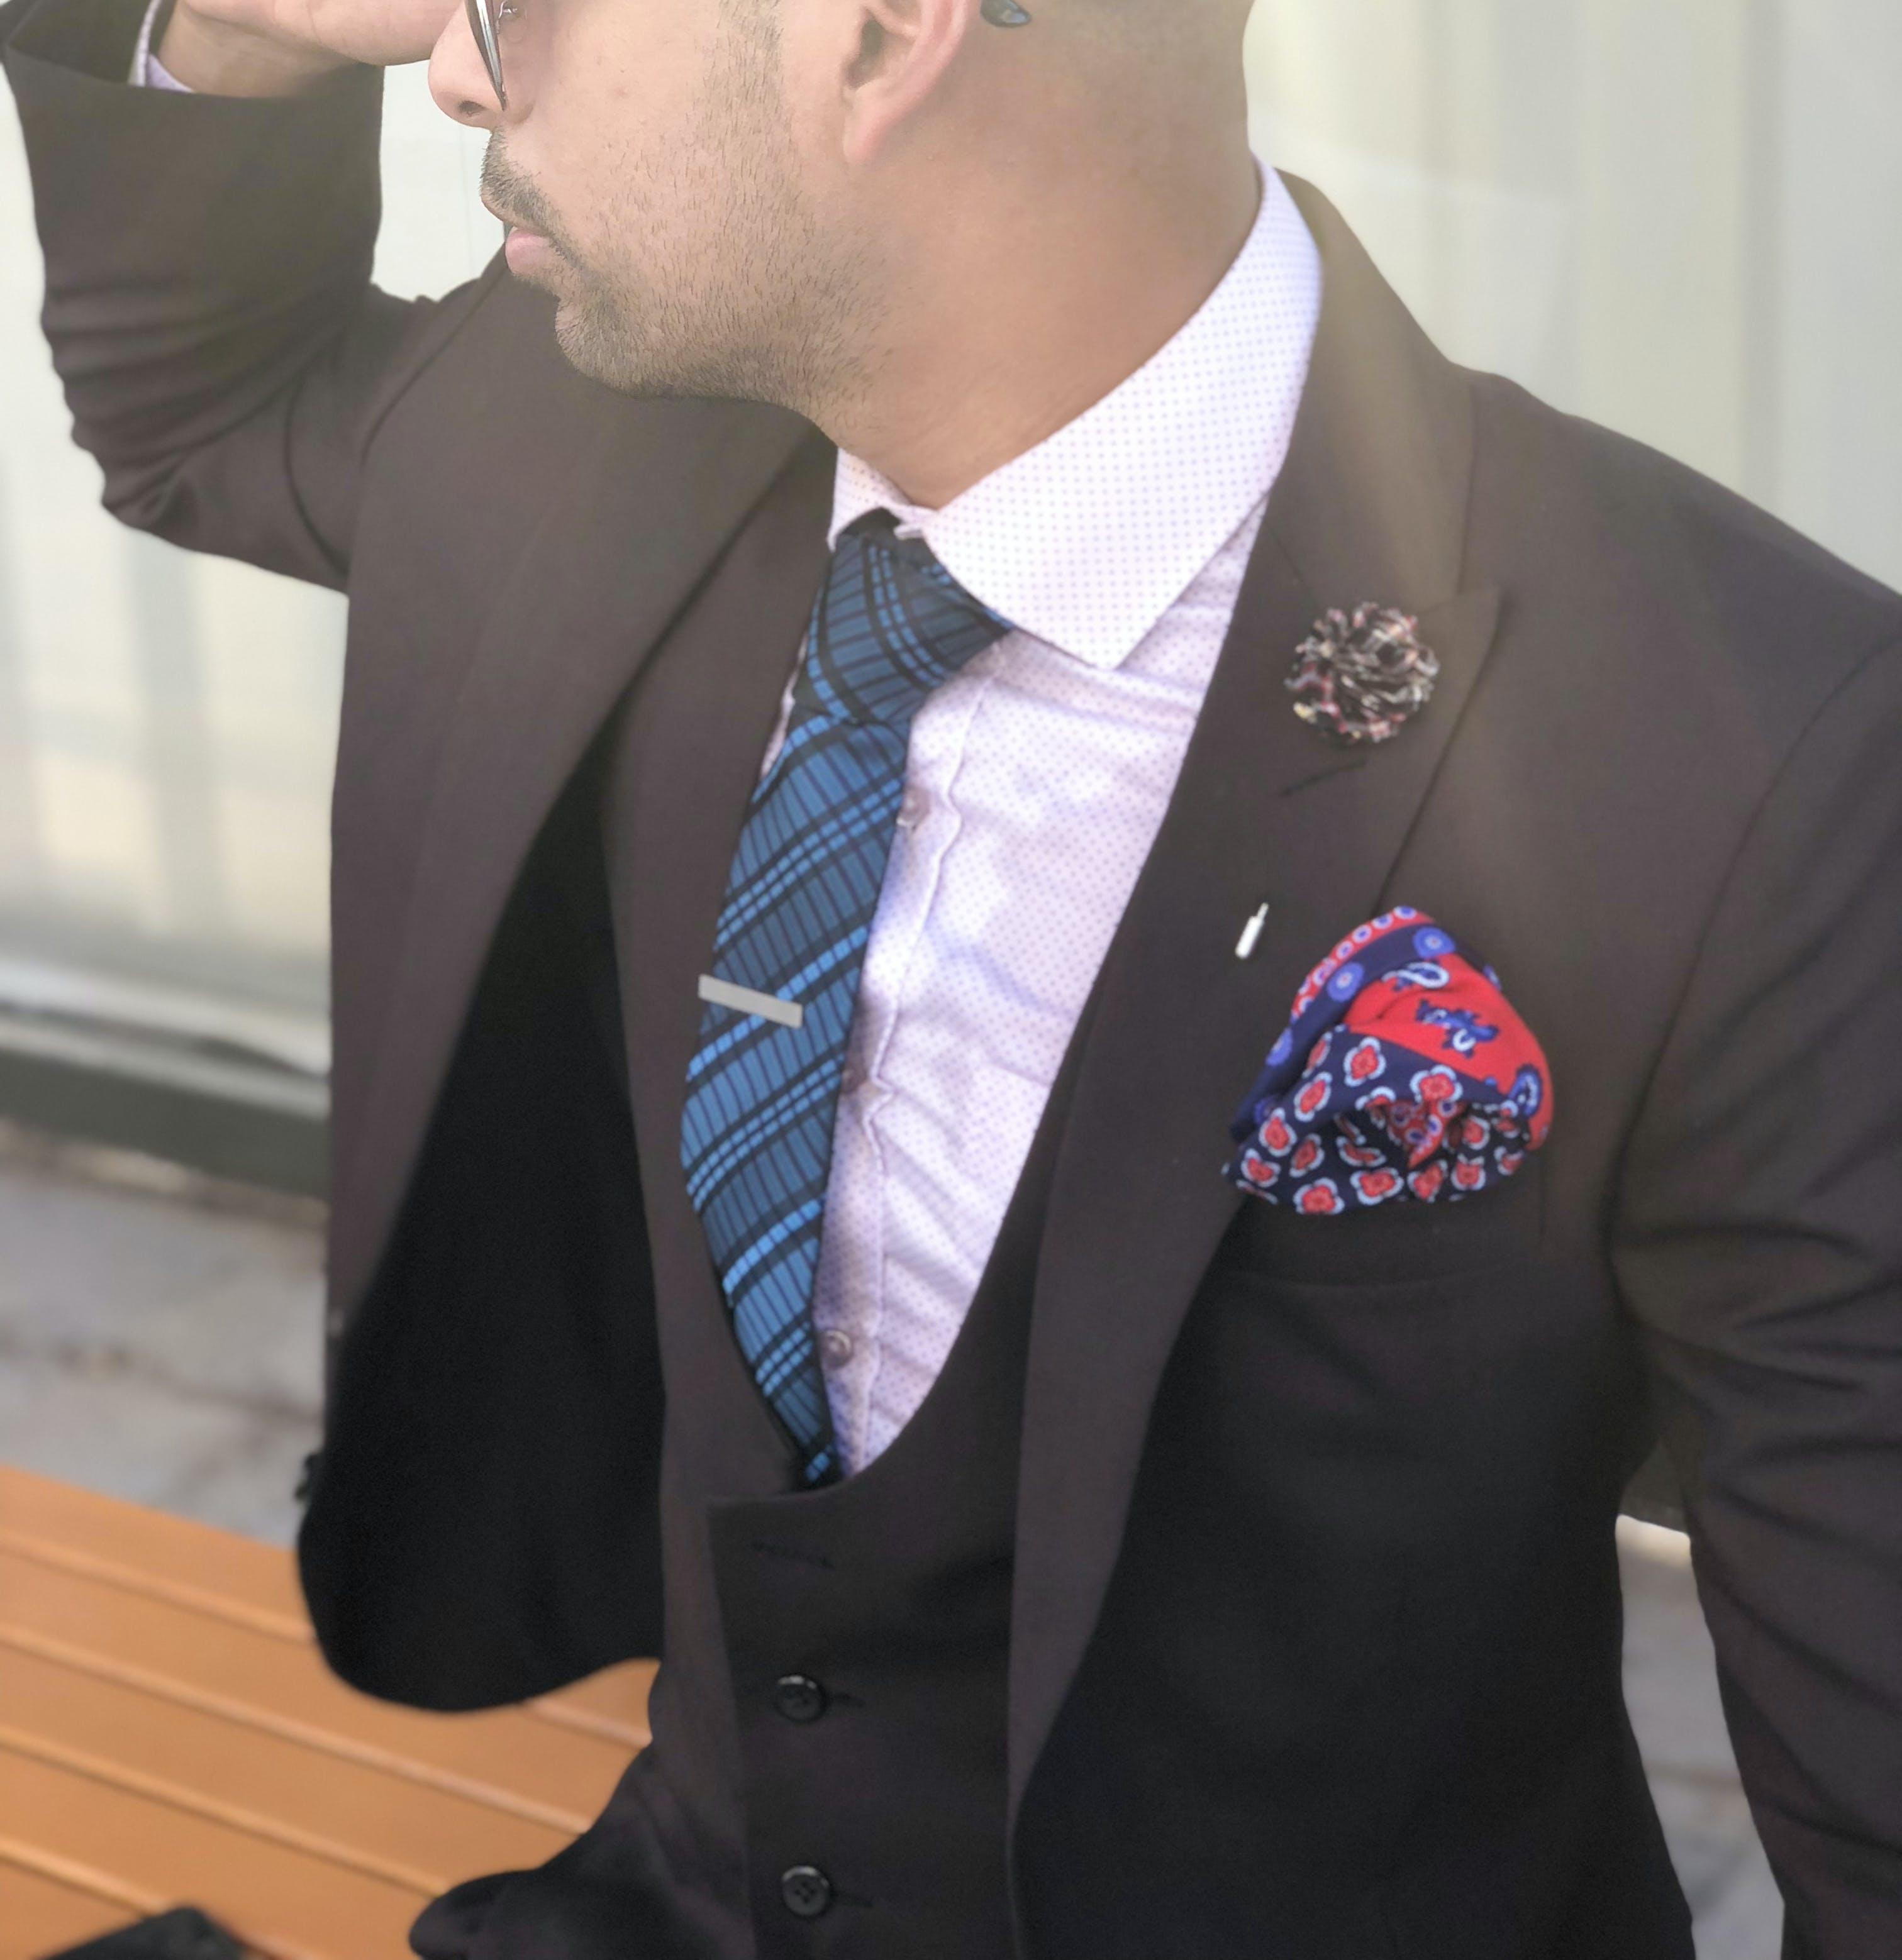 Man in Black Suit Jacket